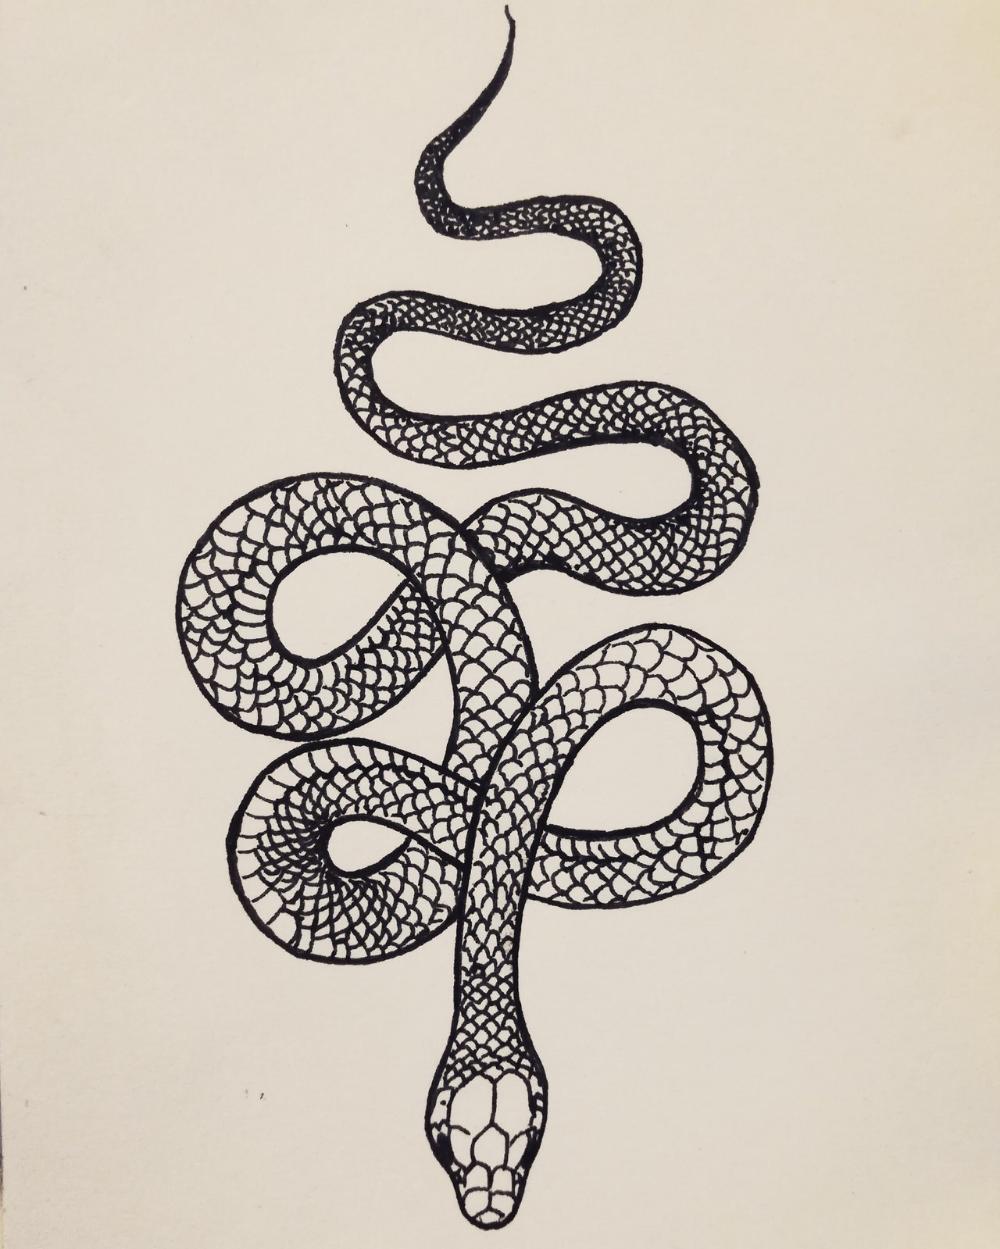 Cattattoo Shouldertattoo Snaketattoo Tattoohombre Snake Tattoo Design Henna Tattoo Designs Tattoos